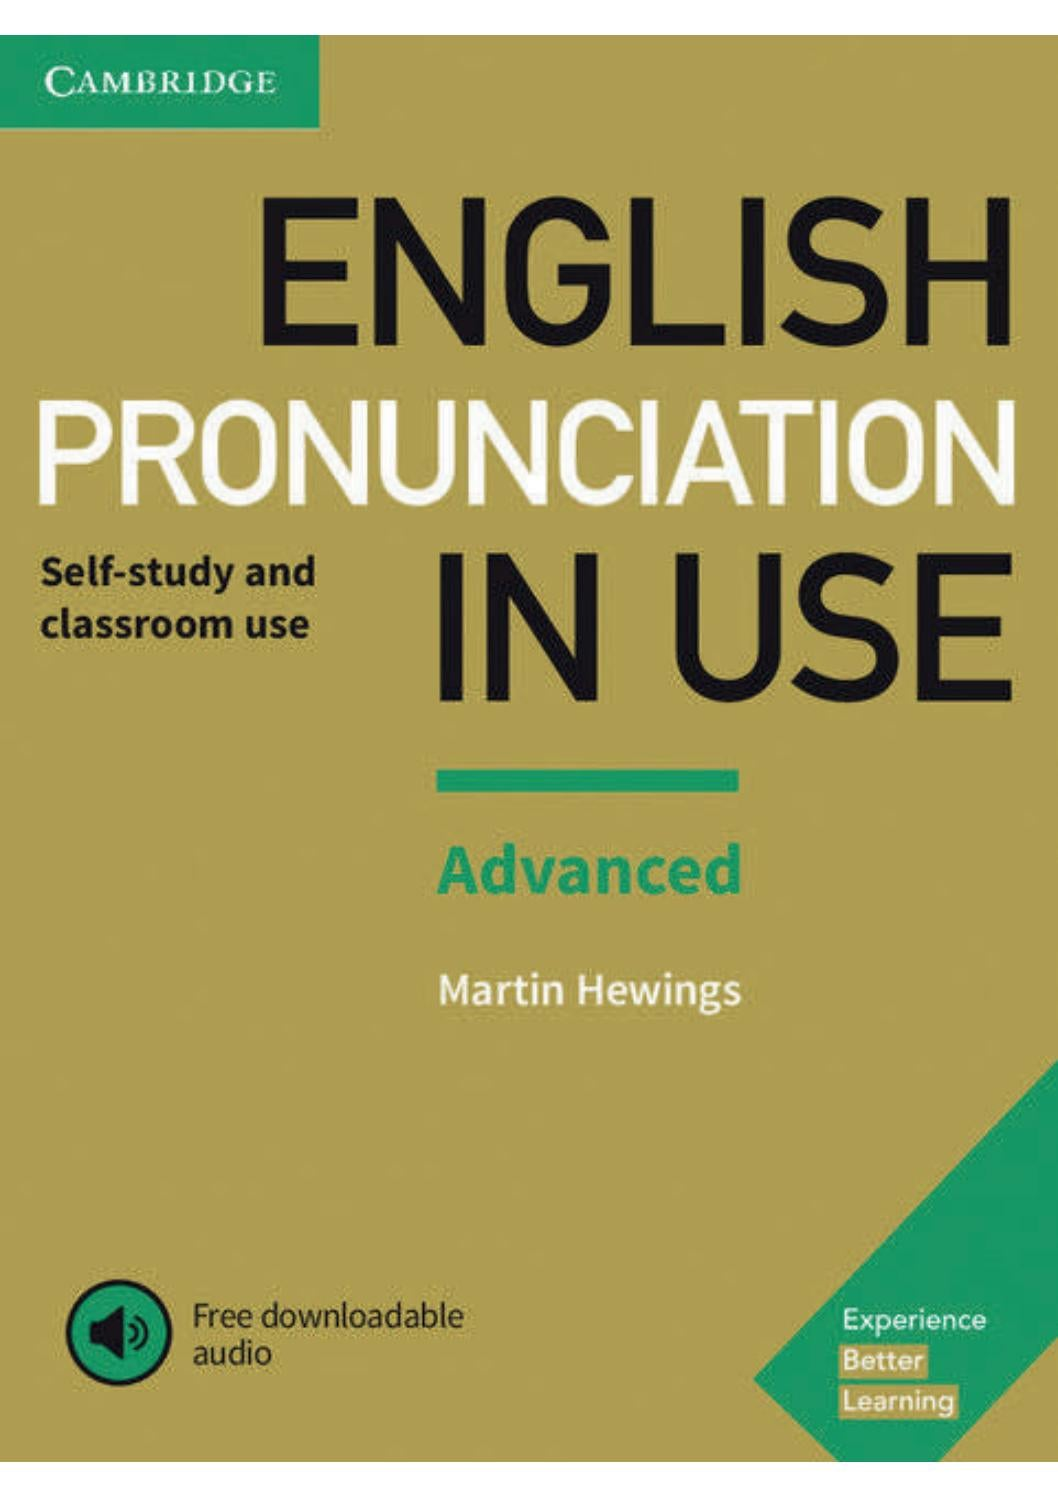 English Pronunciation in Use Advanced Book by 華泰文化 Hwa Tai